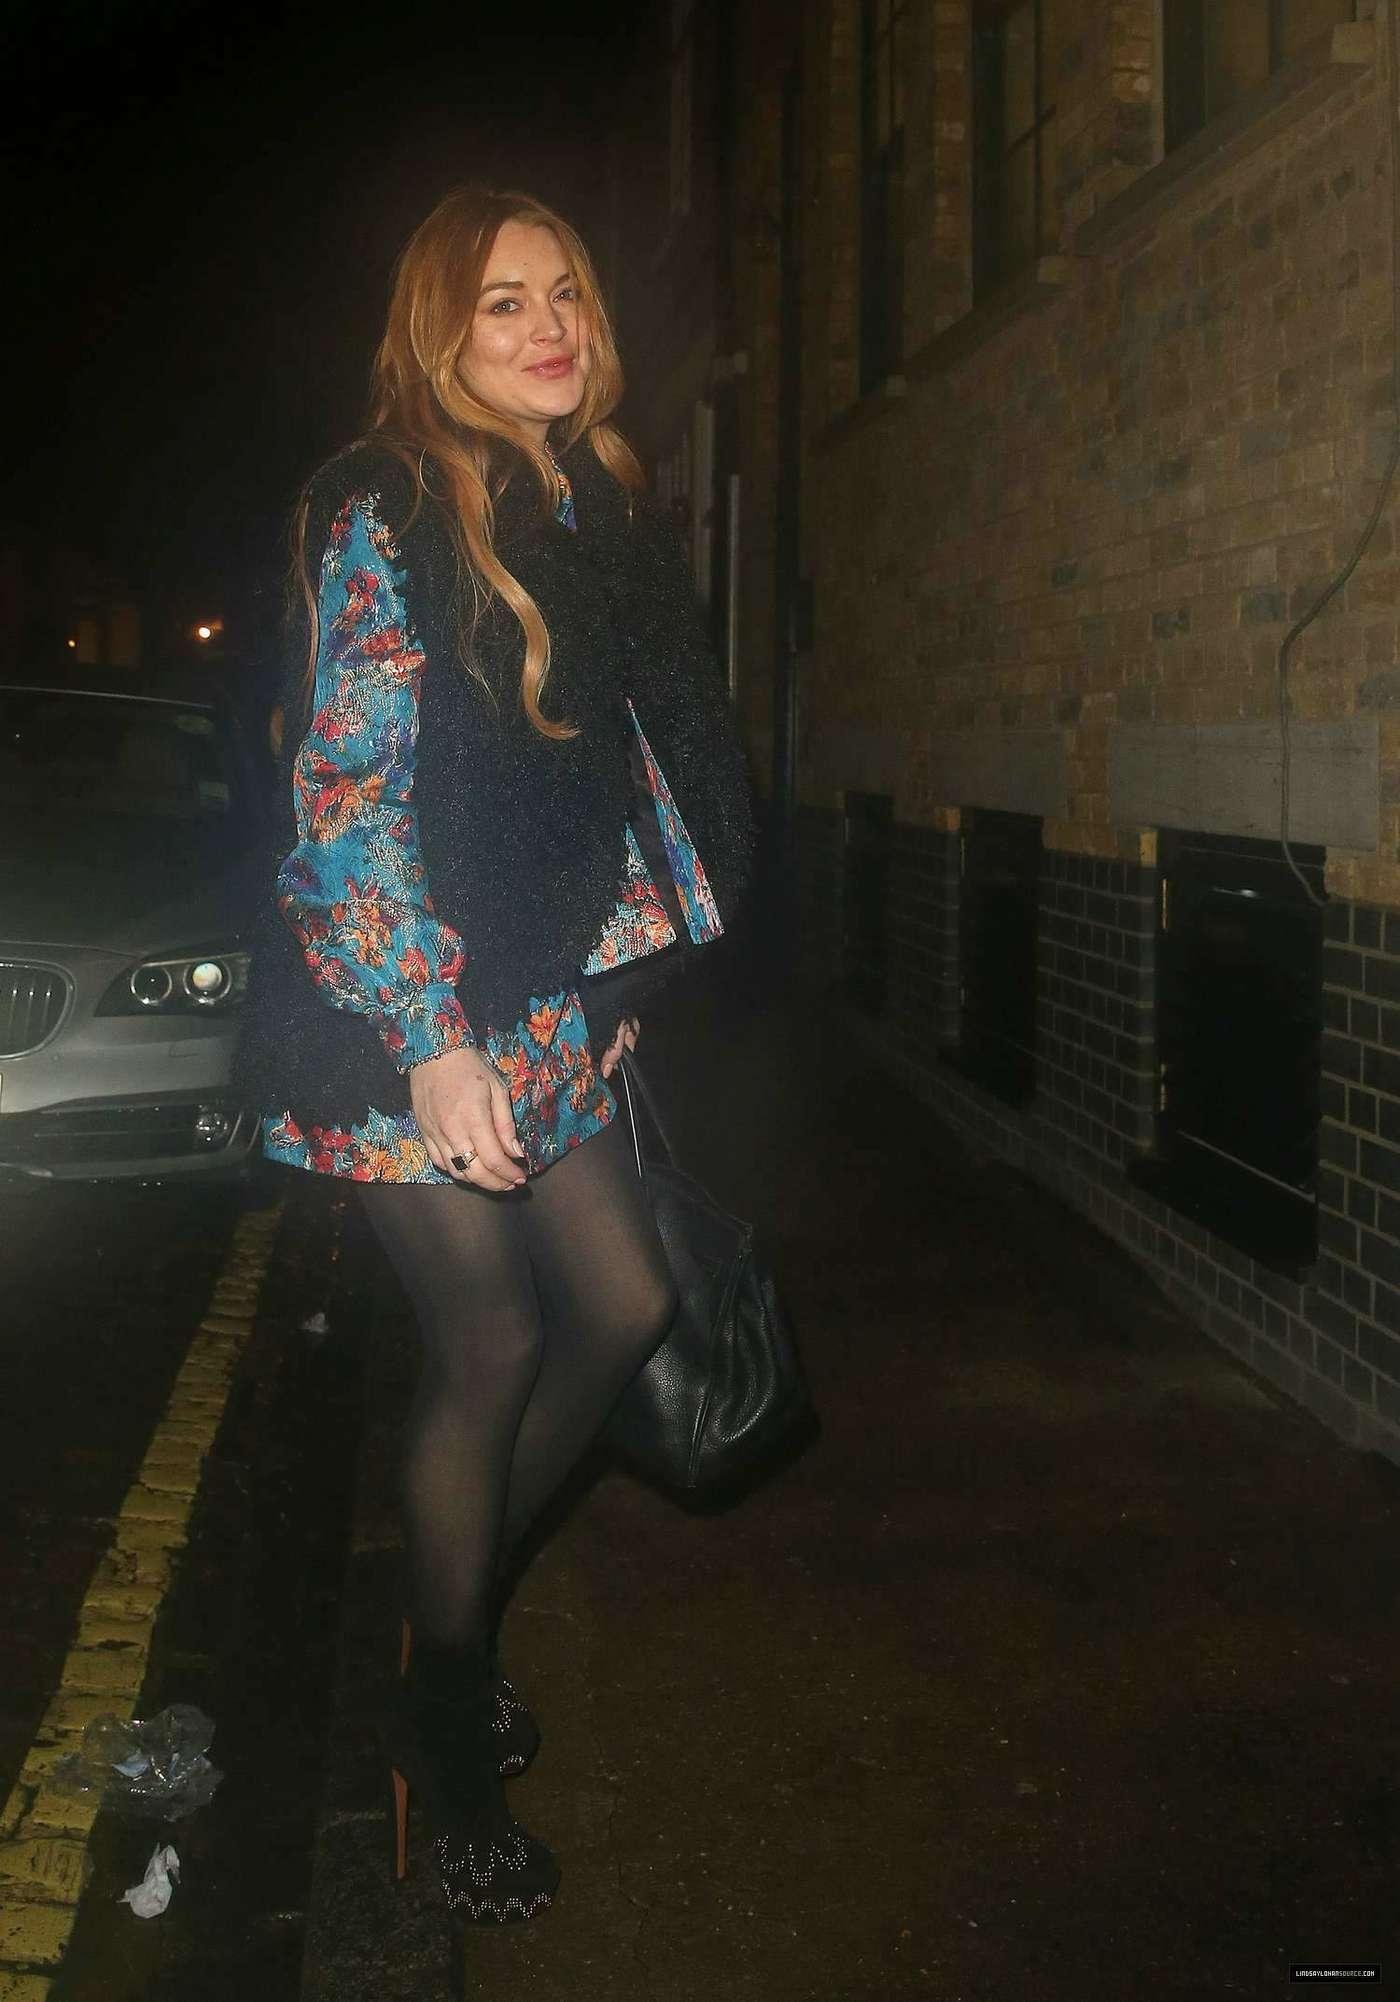 Lindsay Lohan 2014 : Lindsay Lohan in Mini Dress Leaves the Chiltern Firehouse -09